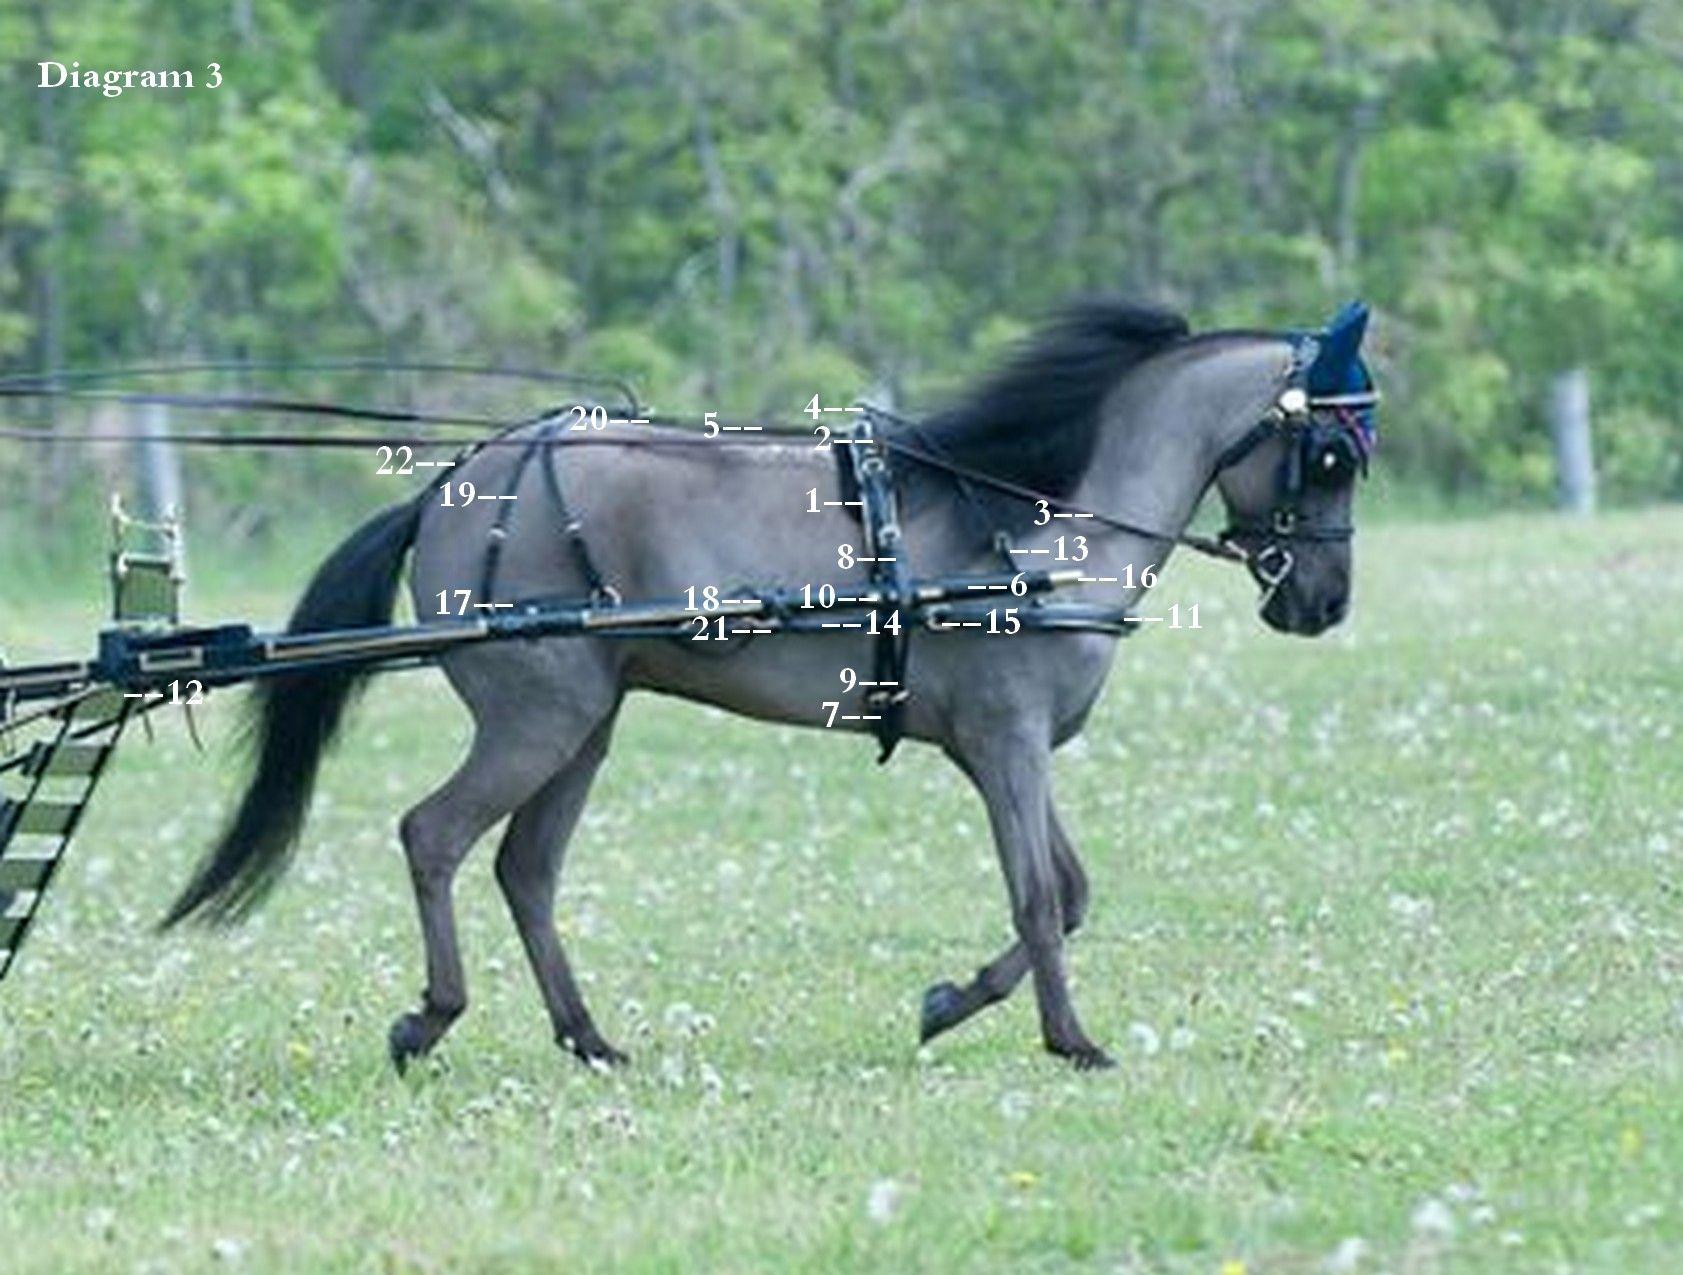 medium resolution of the miniature horse harness ozarkcanada horse harness harness racing miniature shetland pony